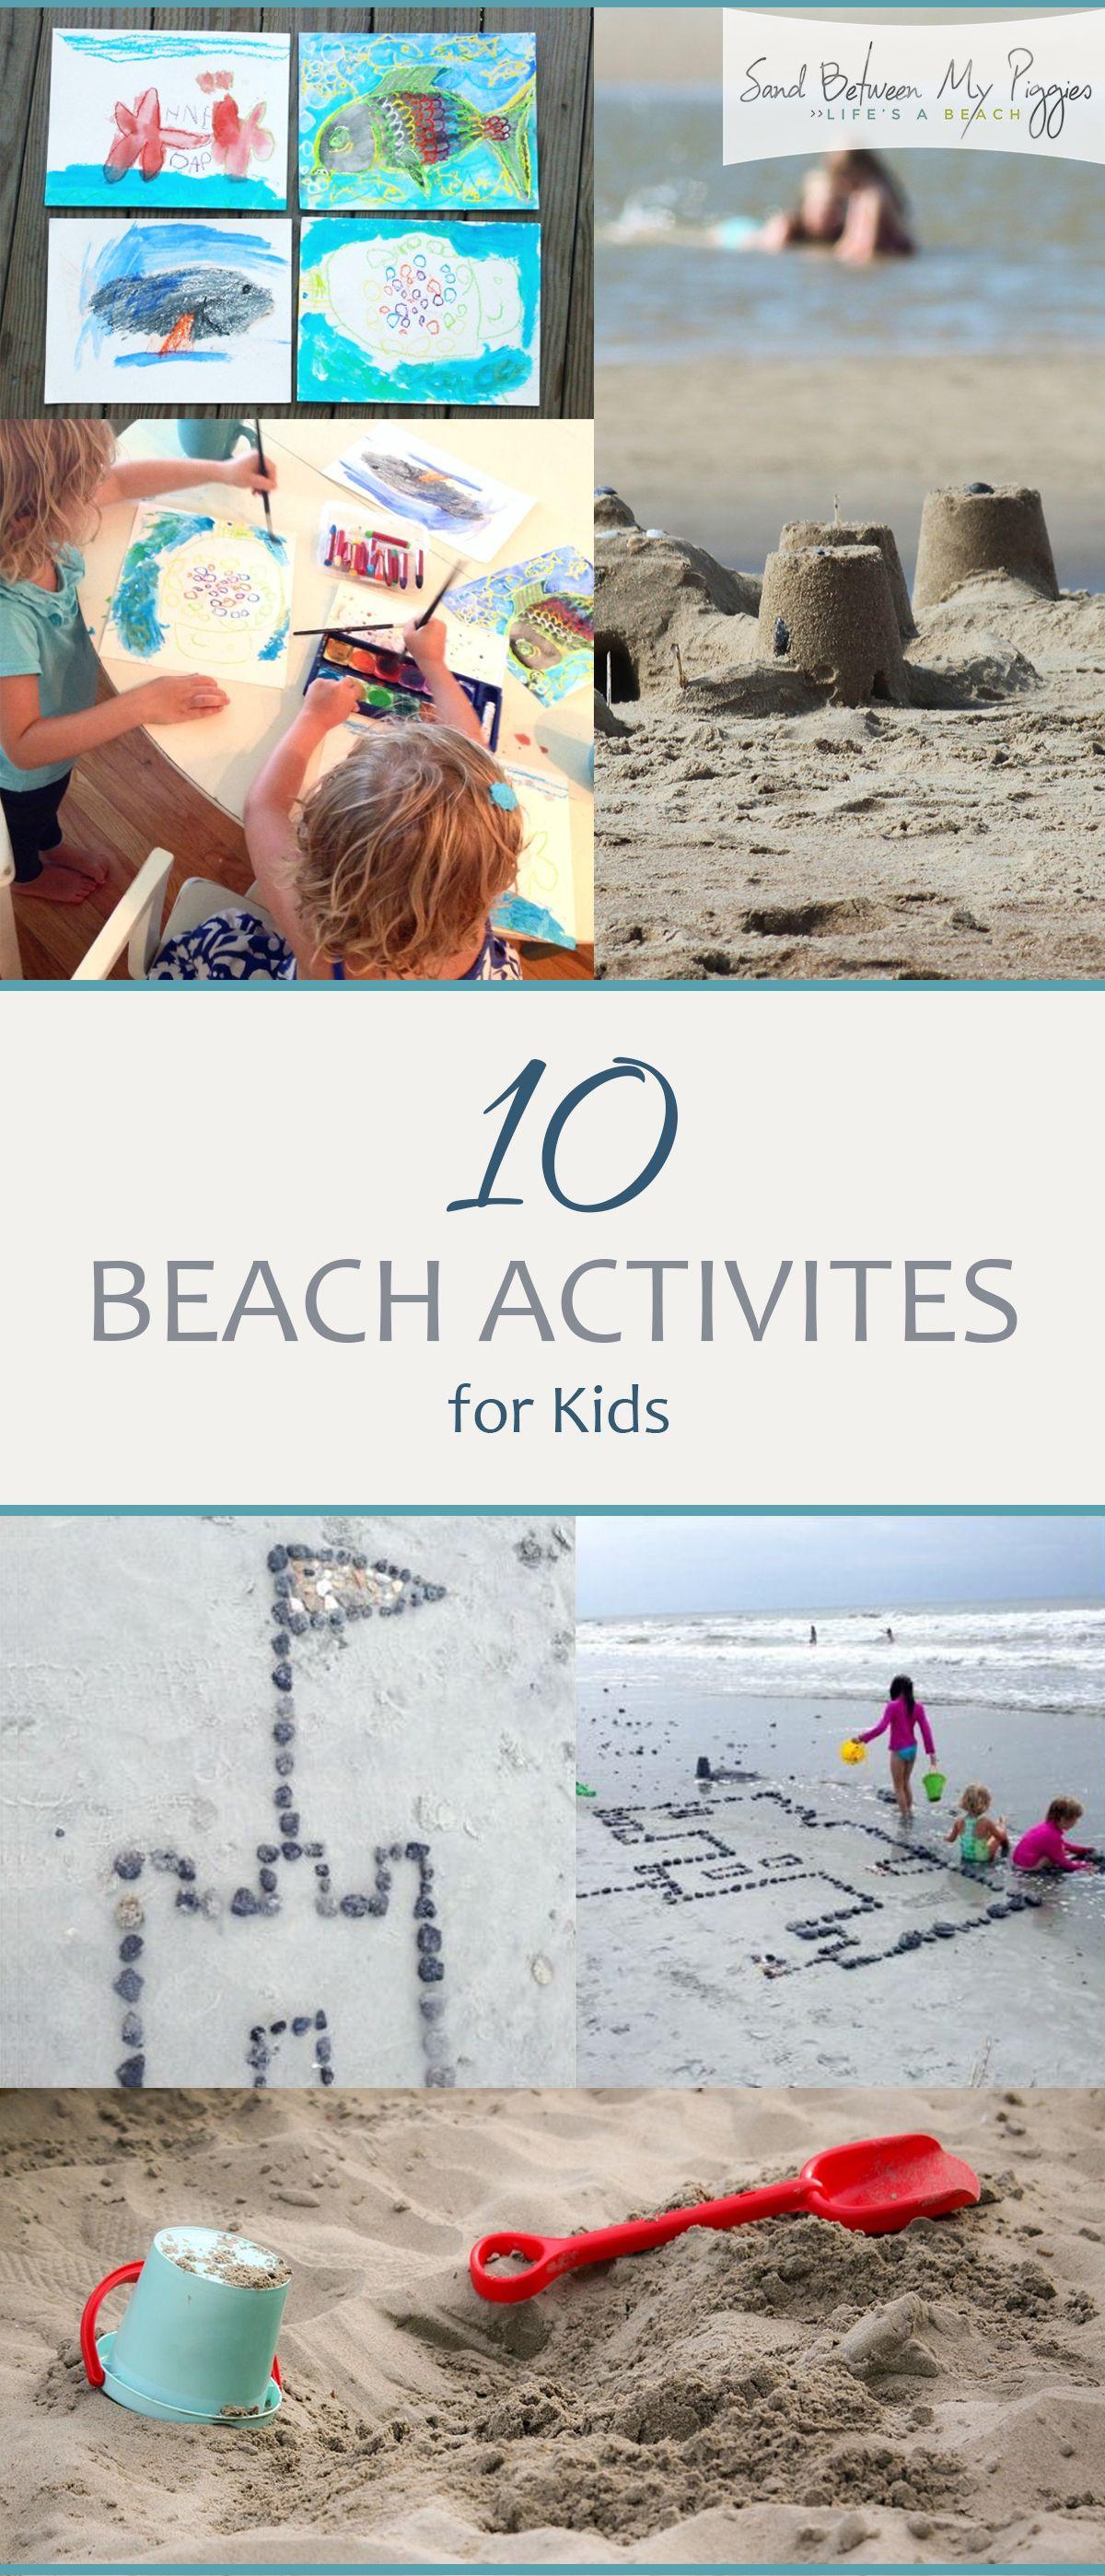 Beach Activites for Kids